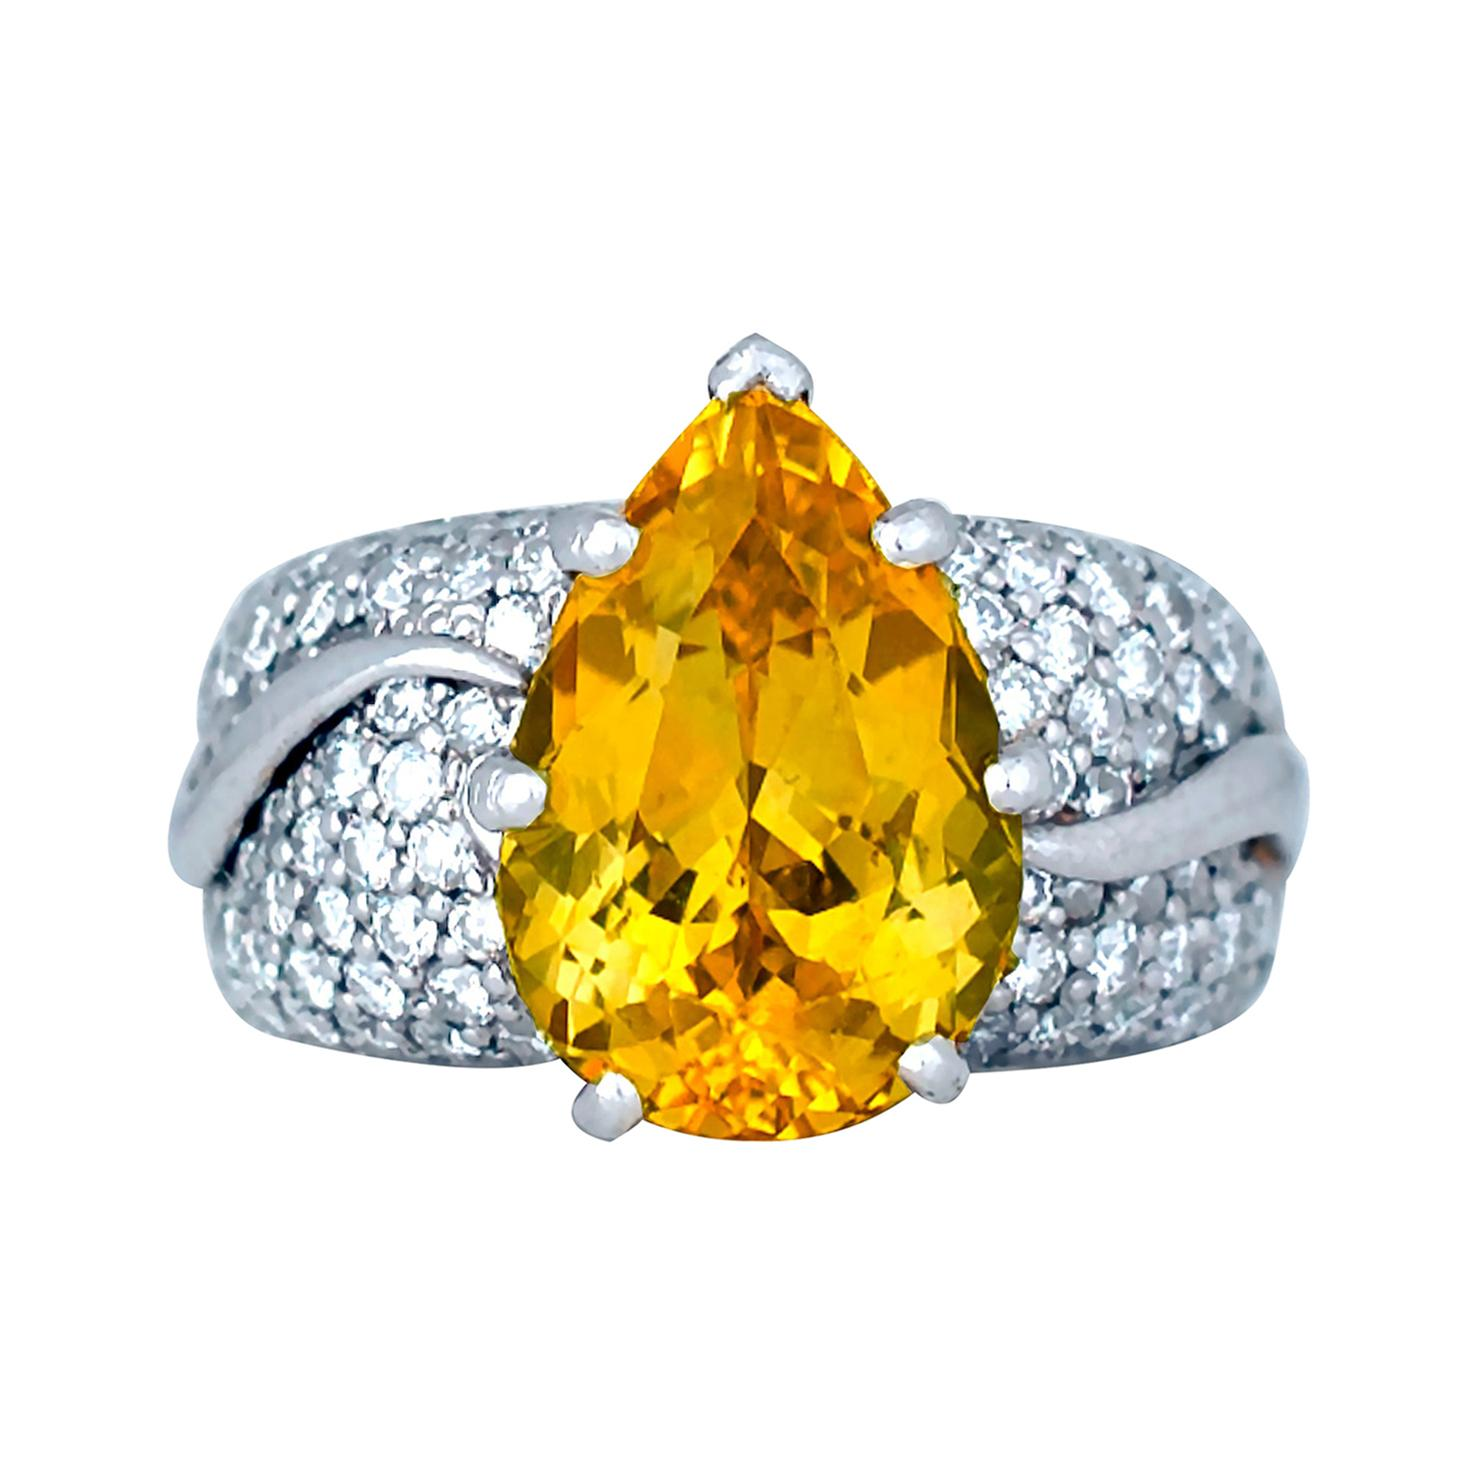 13.5 Carat Yellow Sapphire and Diamond 18 Karat Ring